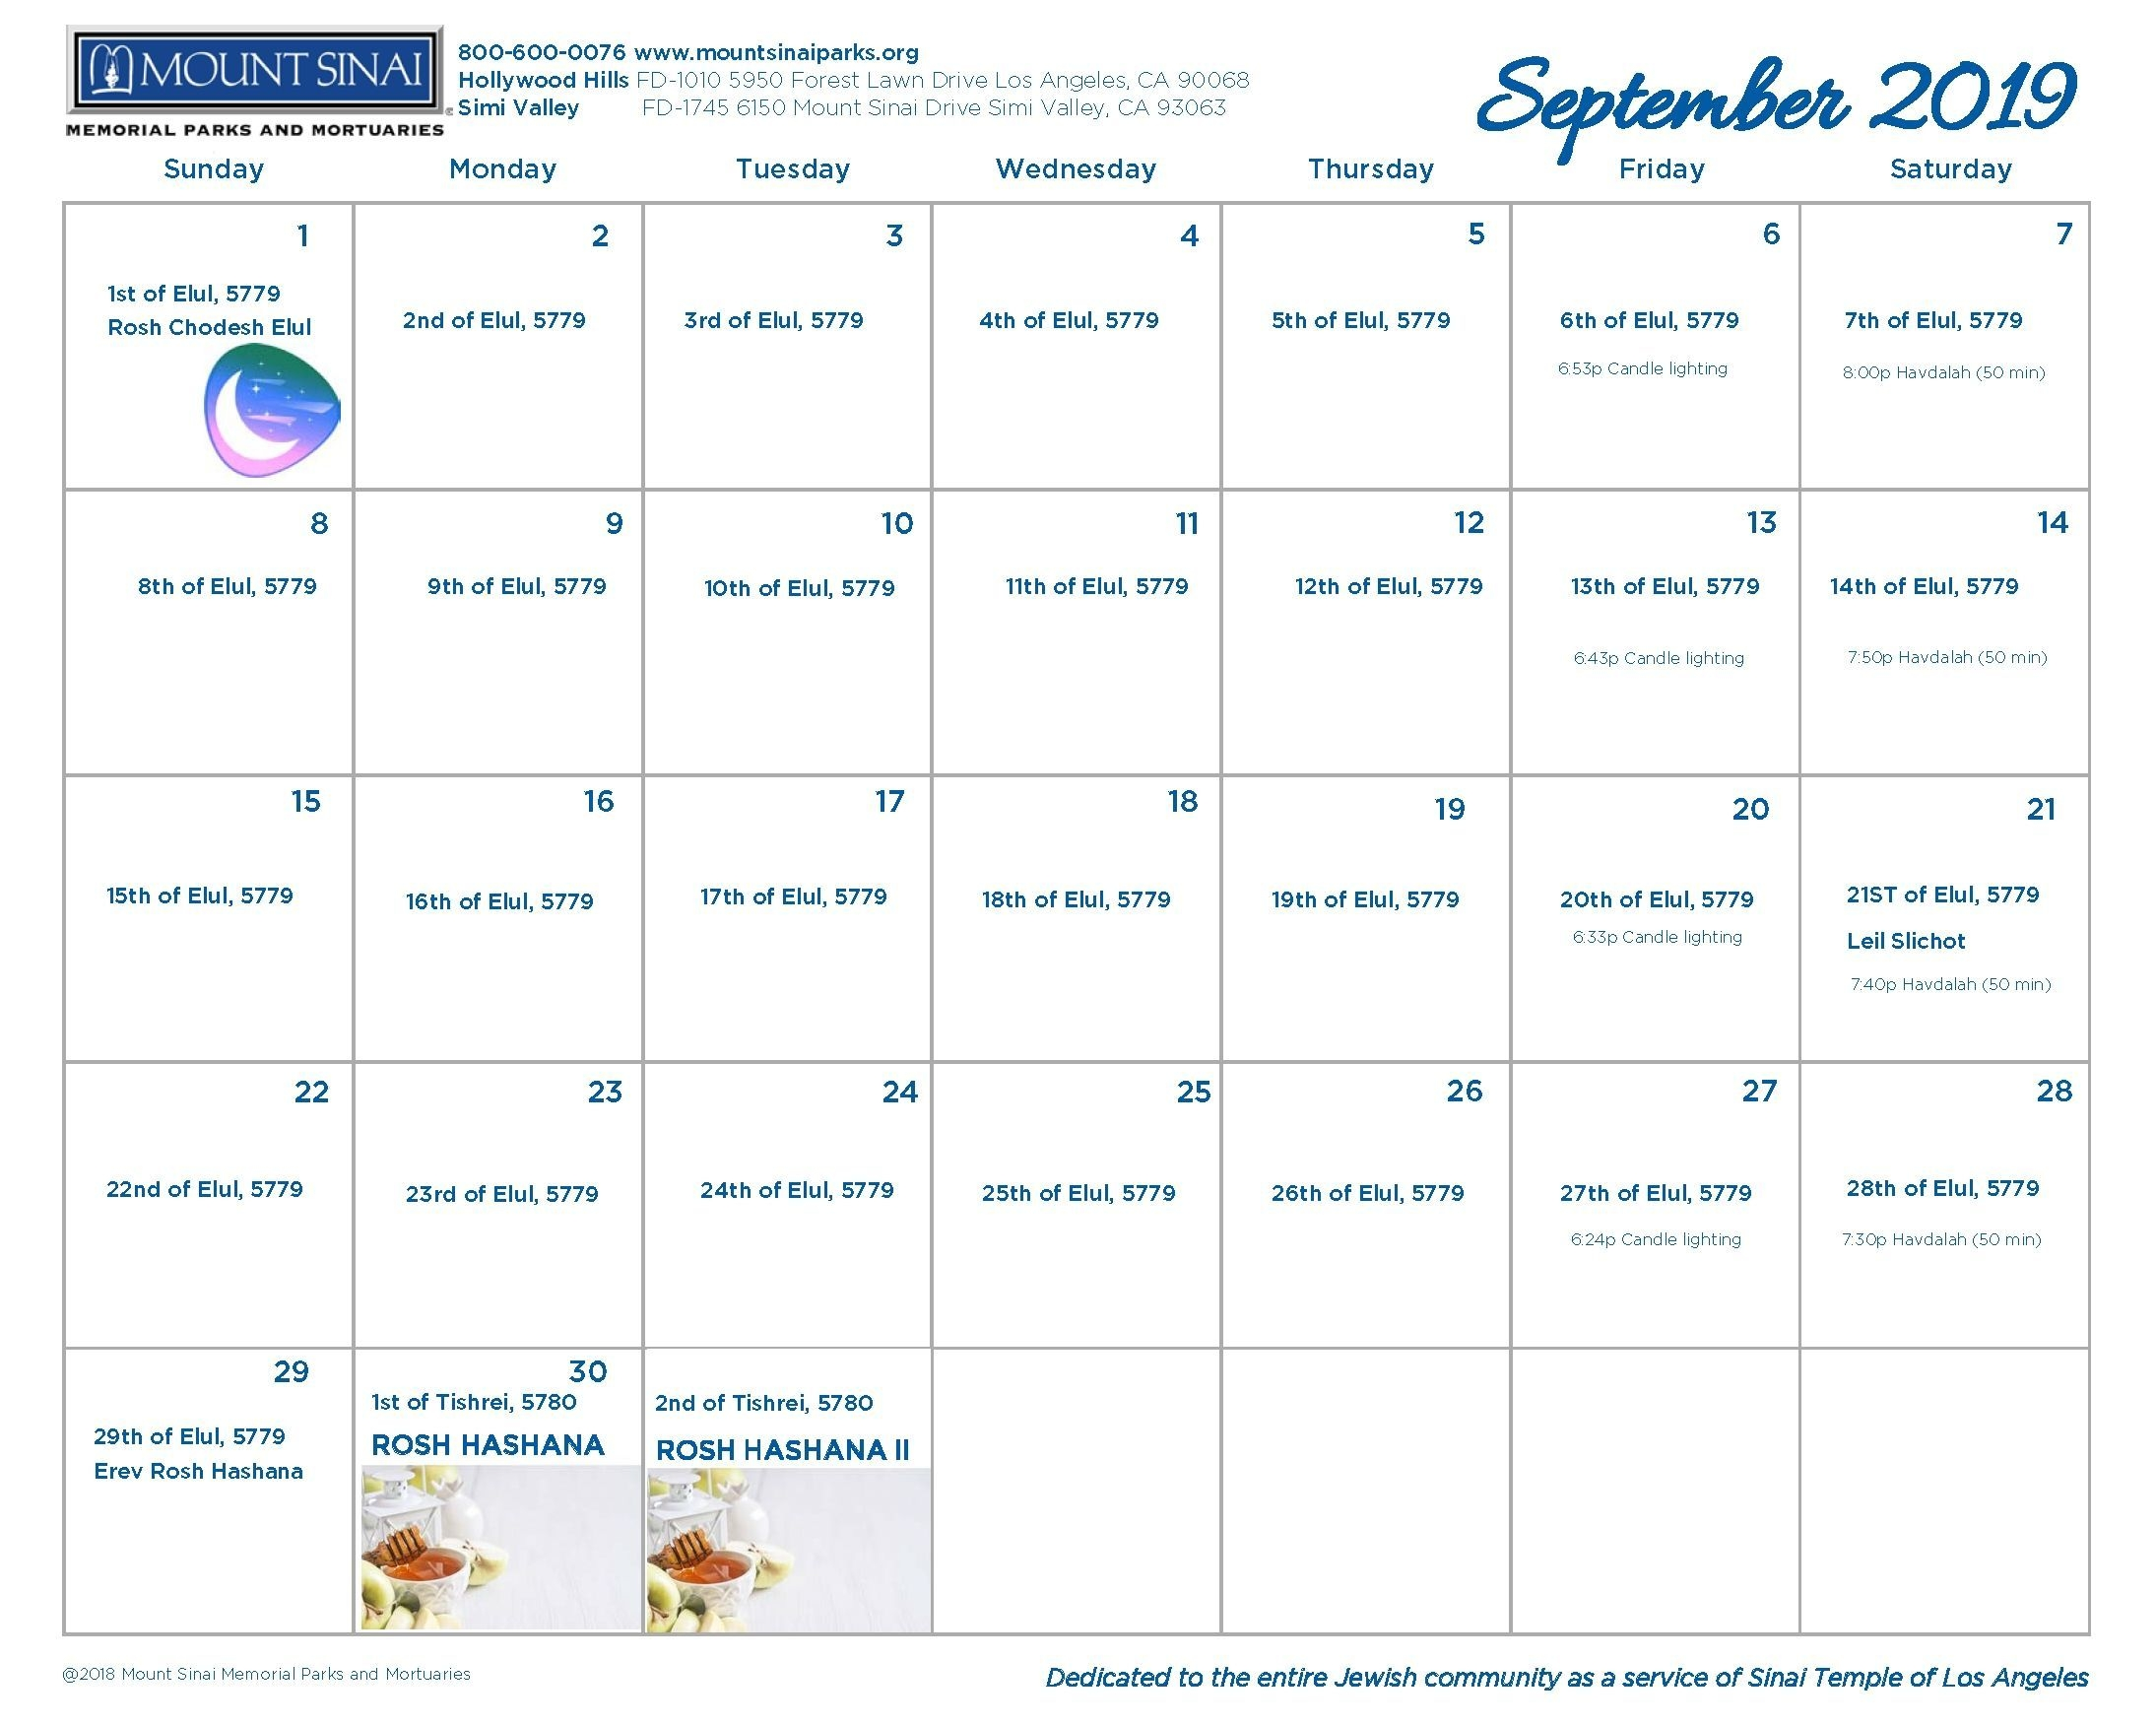 5779 hebrew calendar mount sinai memorial parks and